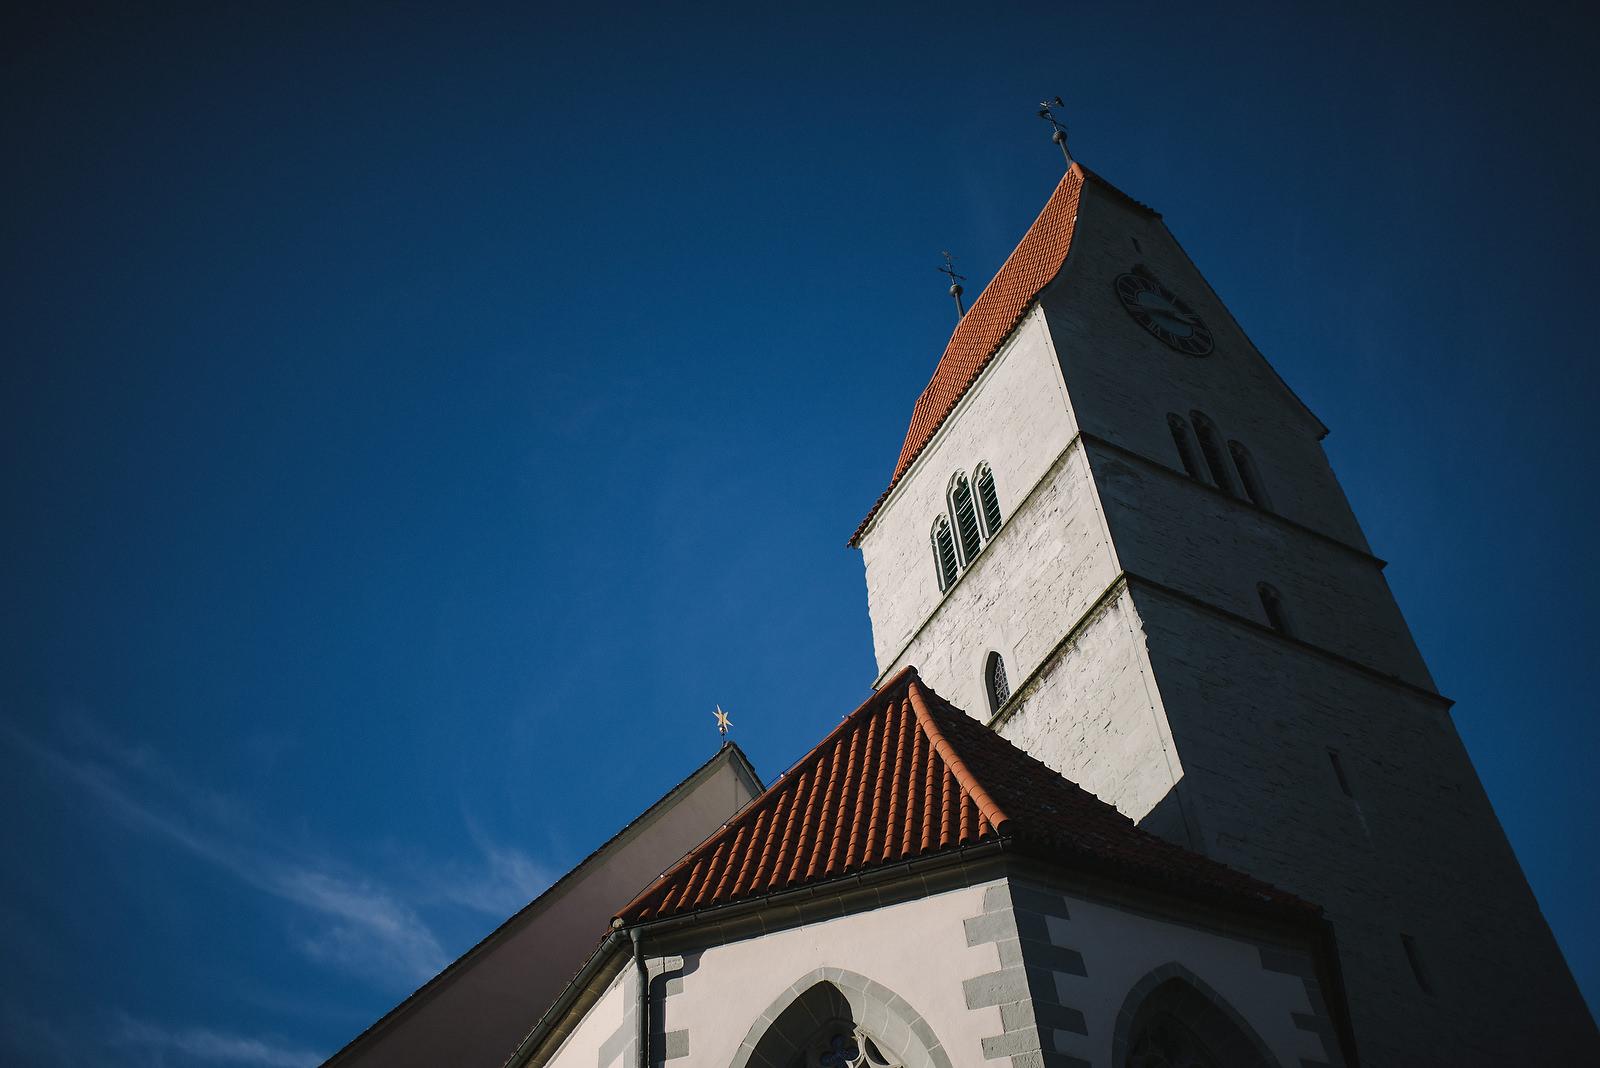 Fotograf Konstanz - Silvester Wedding in Hagnau / Friedrichshafen at Lake of Constance  - 3 -